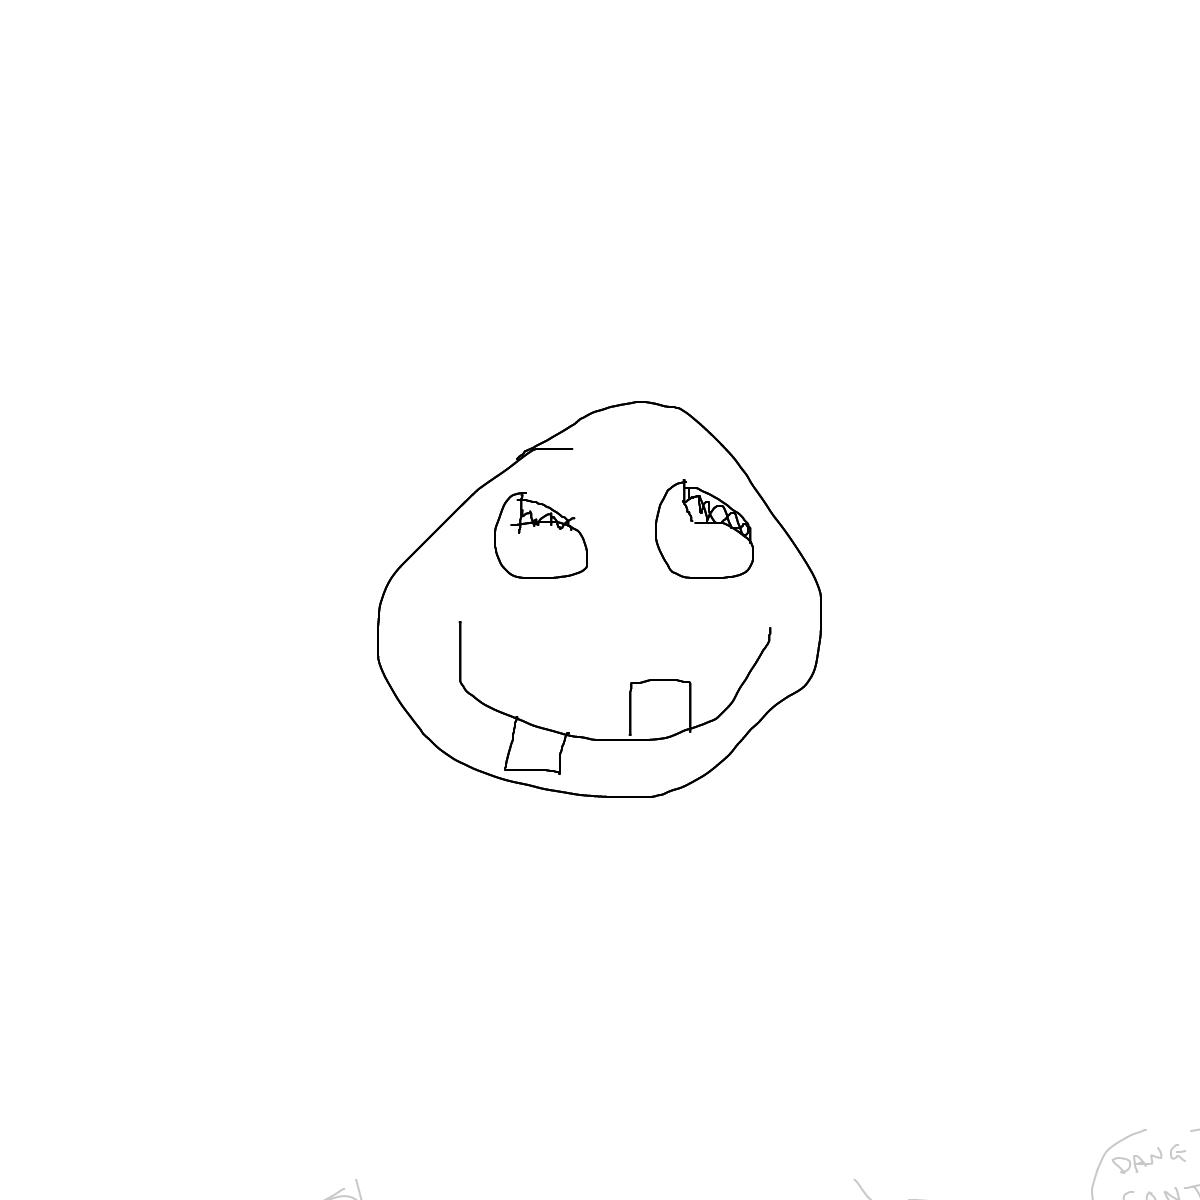 BAAAM drawing#13953 lat:37.2041854858398440lng: 139.7830810546875000